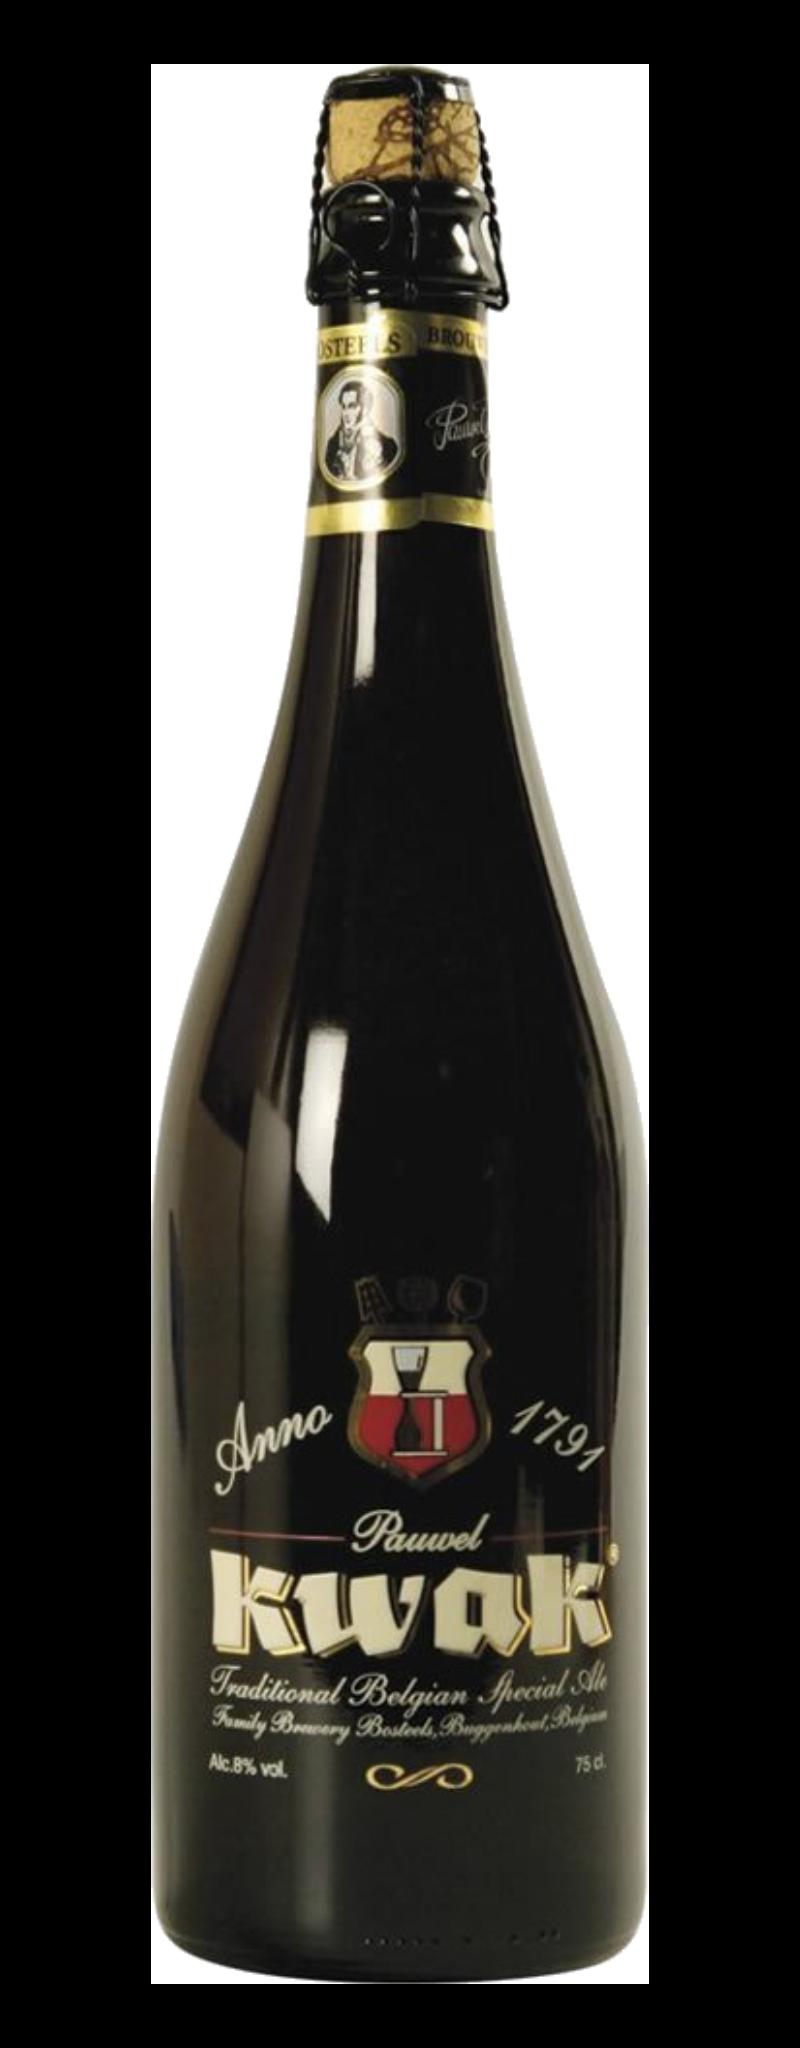 Pauwel Kwak (12 chai/thùng)  - 750ml